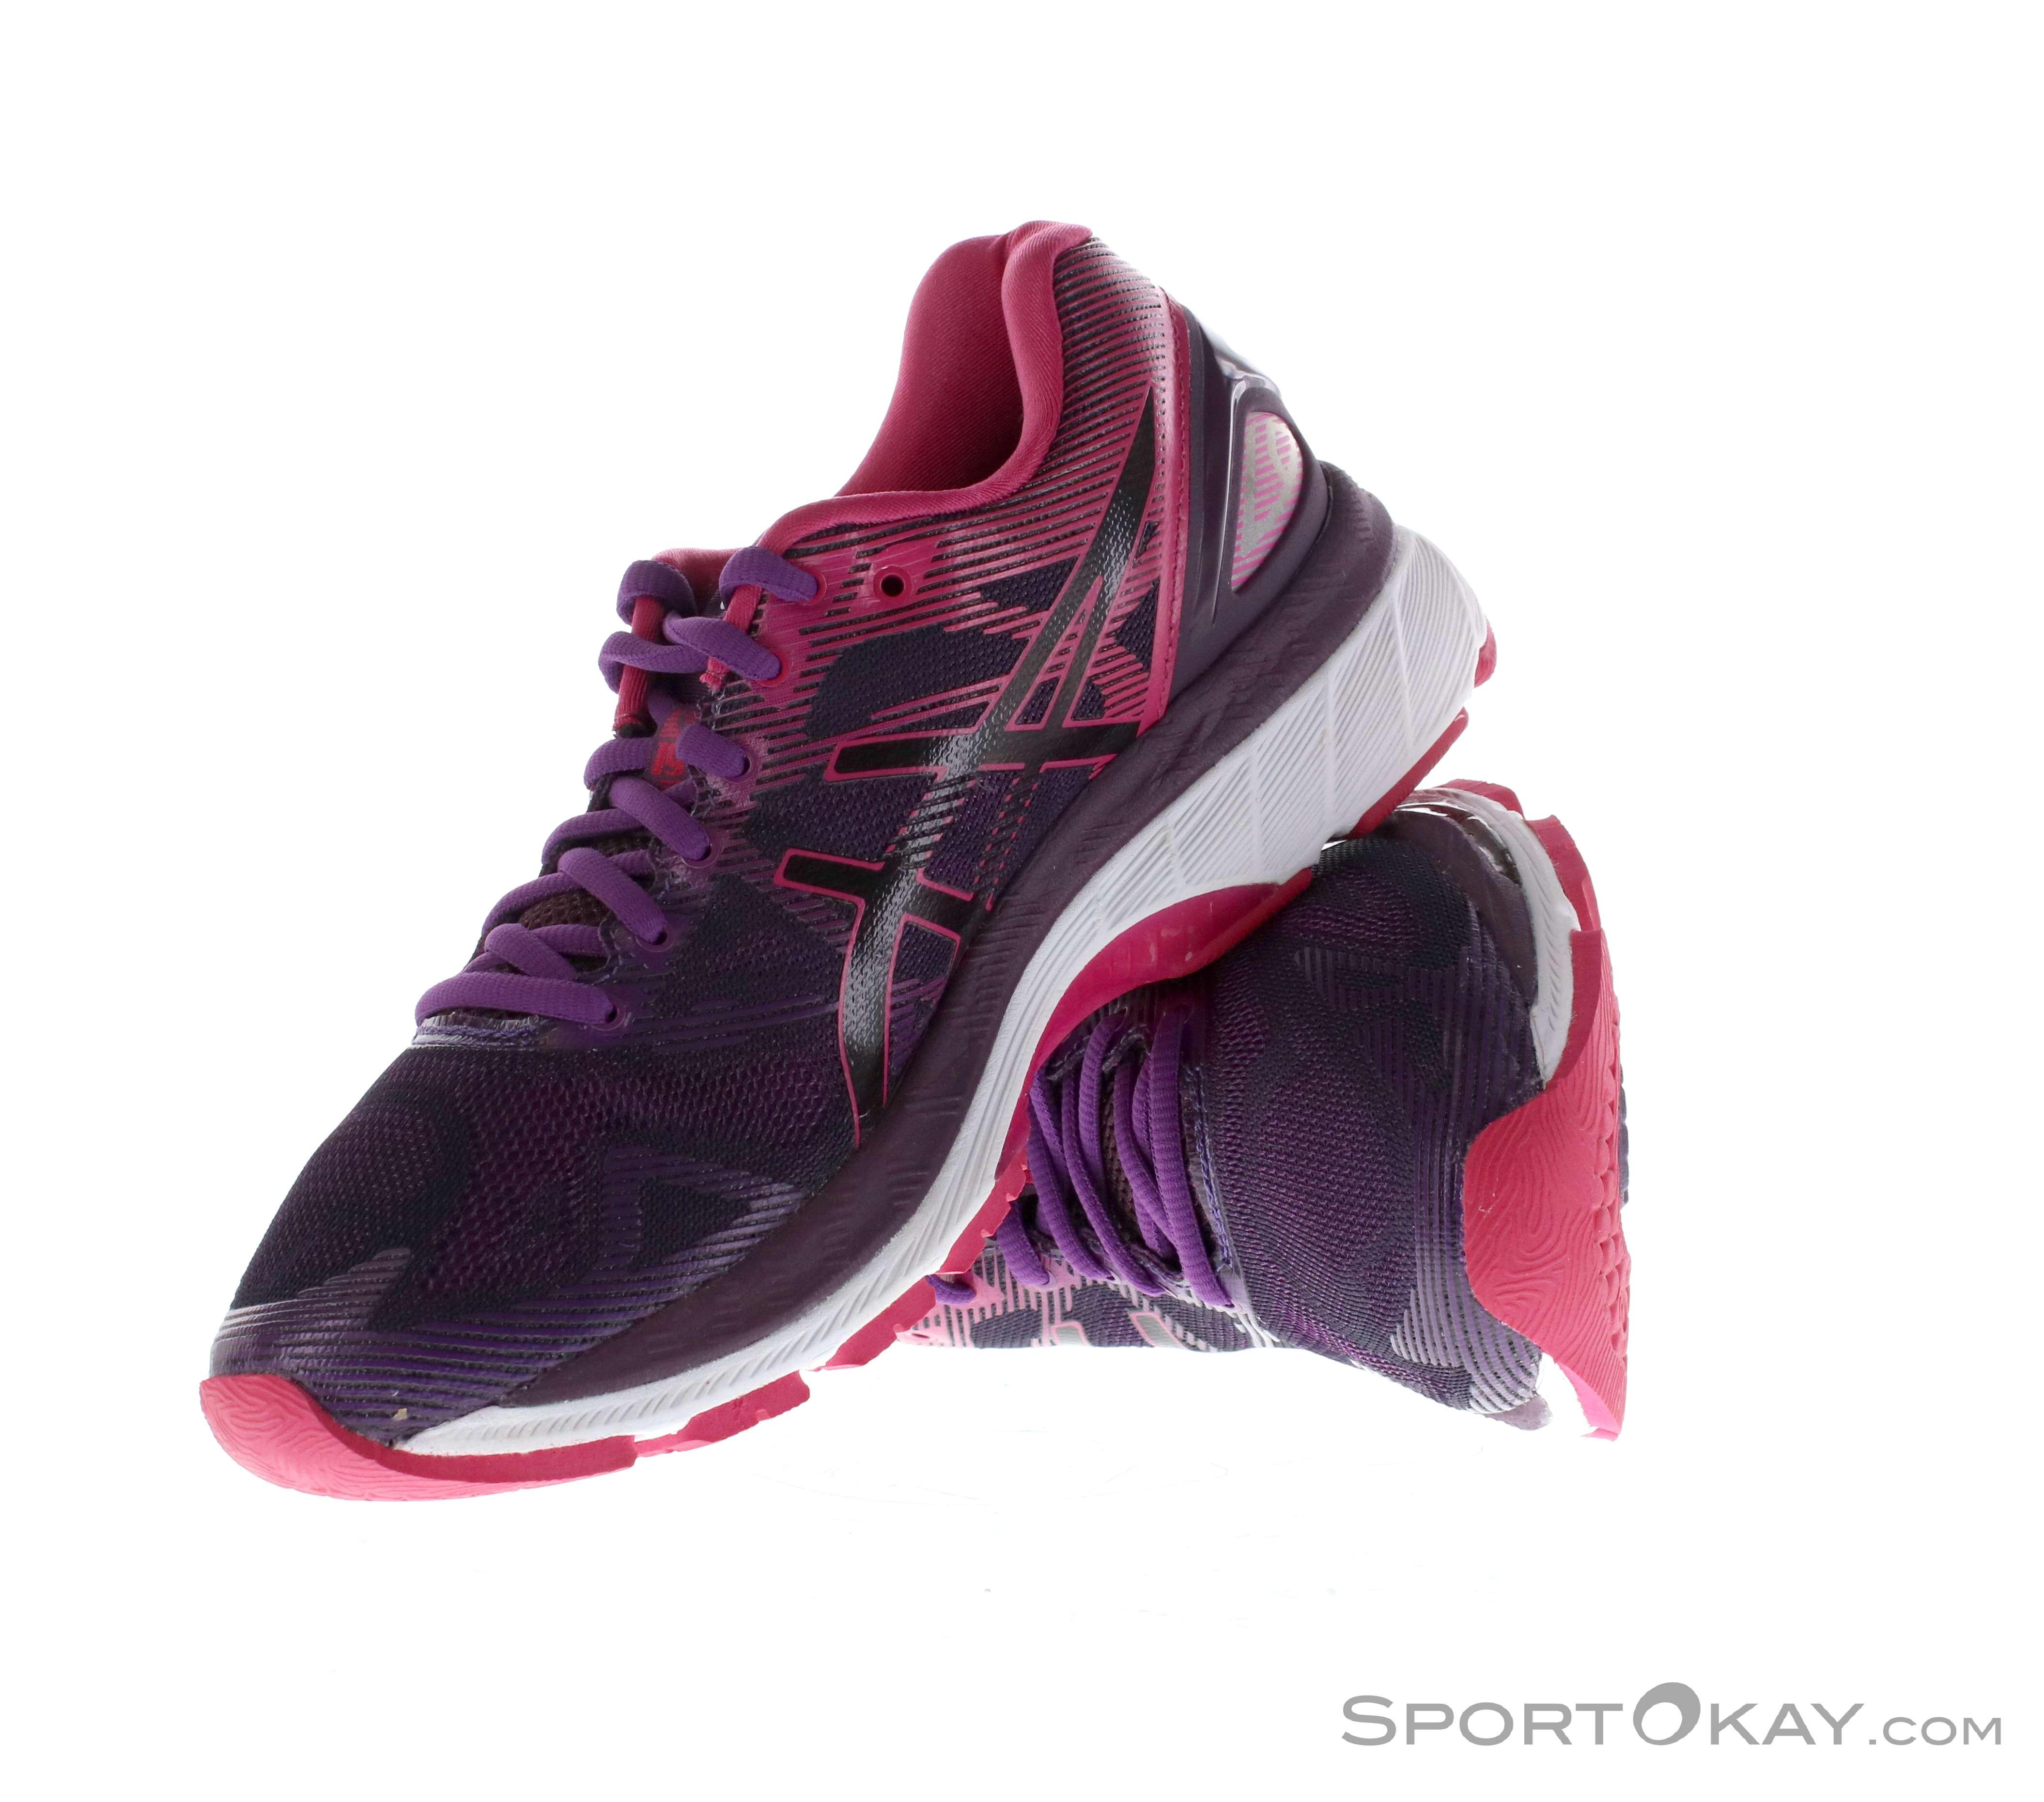 Asics Gel Nimbus 19 Womens Running Shoes Running Shoes